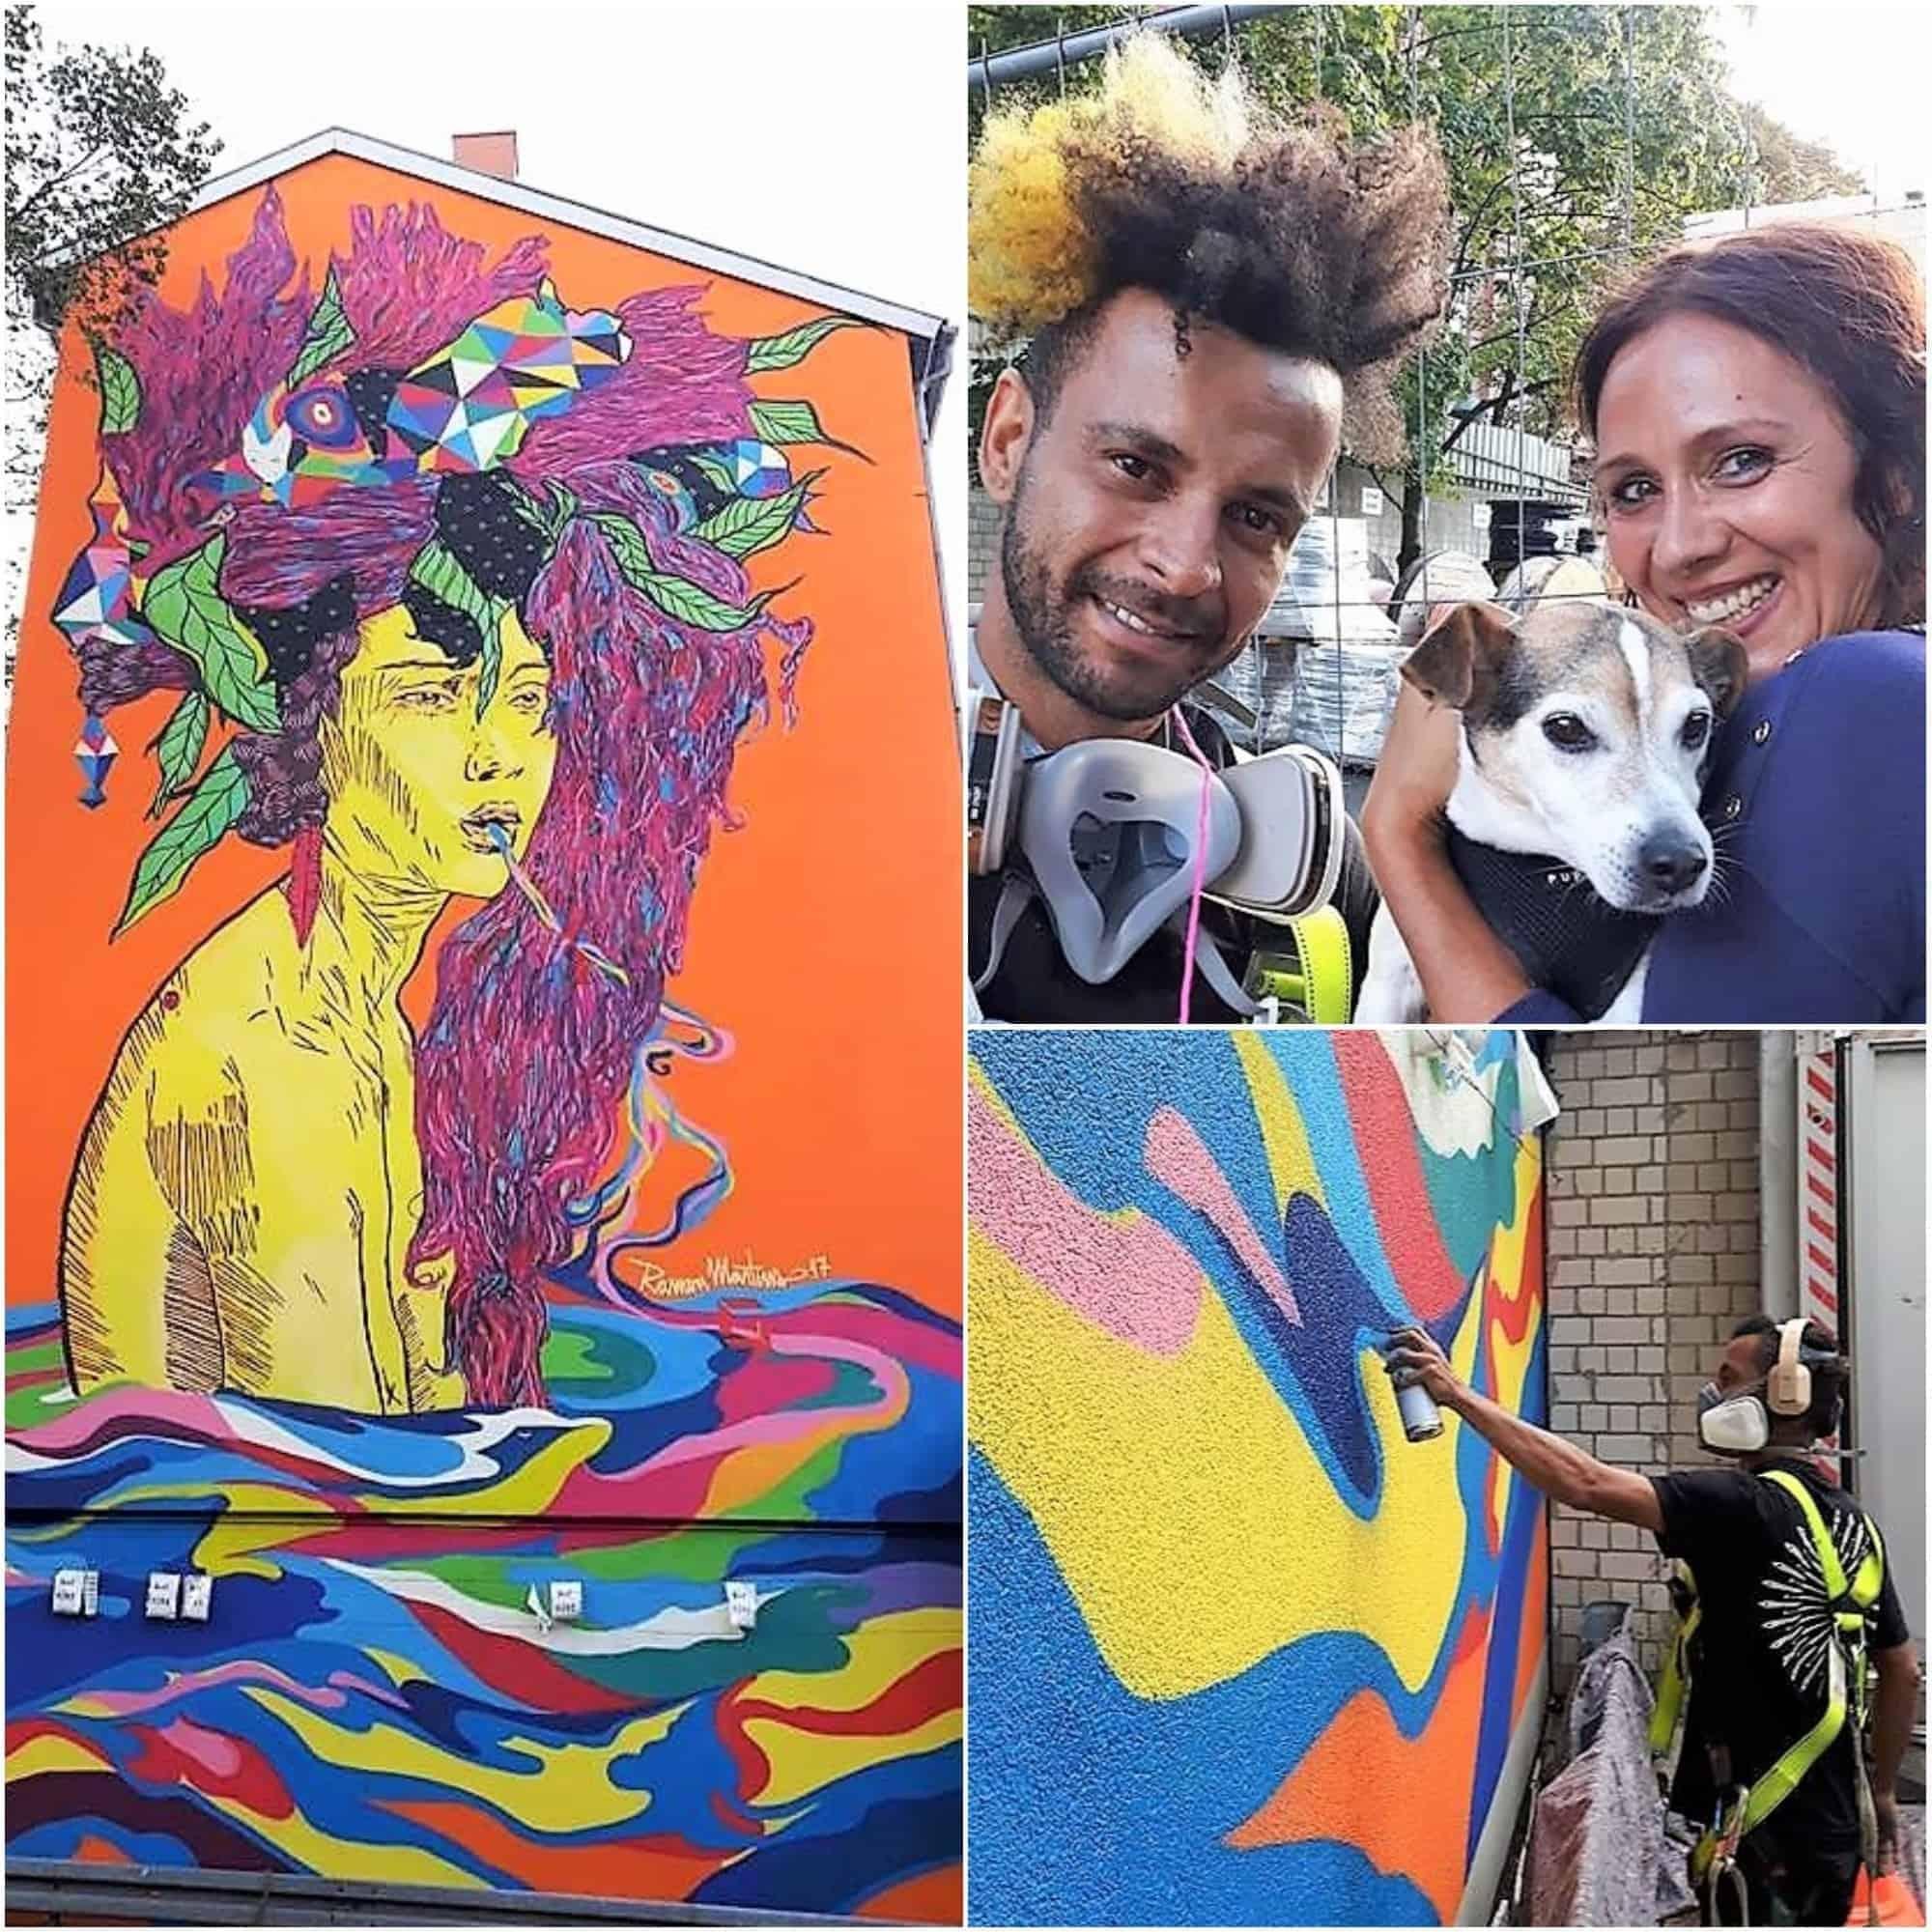 style hannover mansha friedrich streetart - Street-Art-Künstlerin Mansha Friedrich